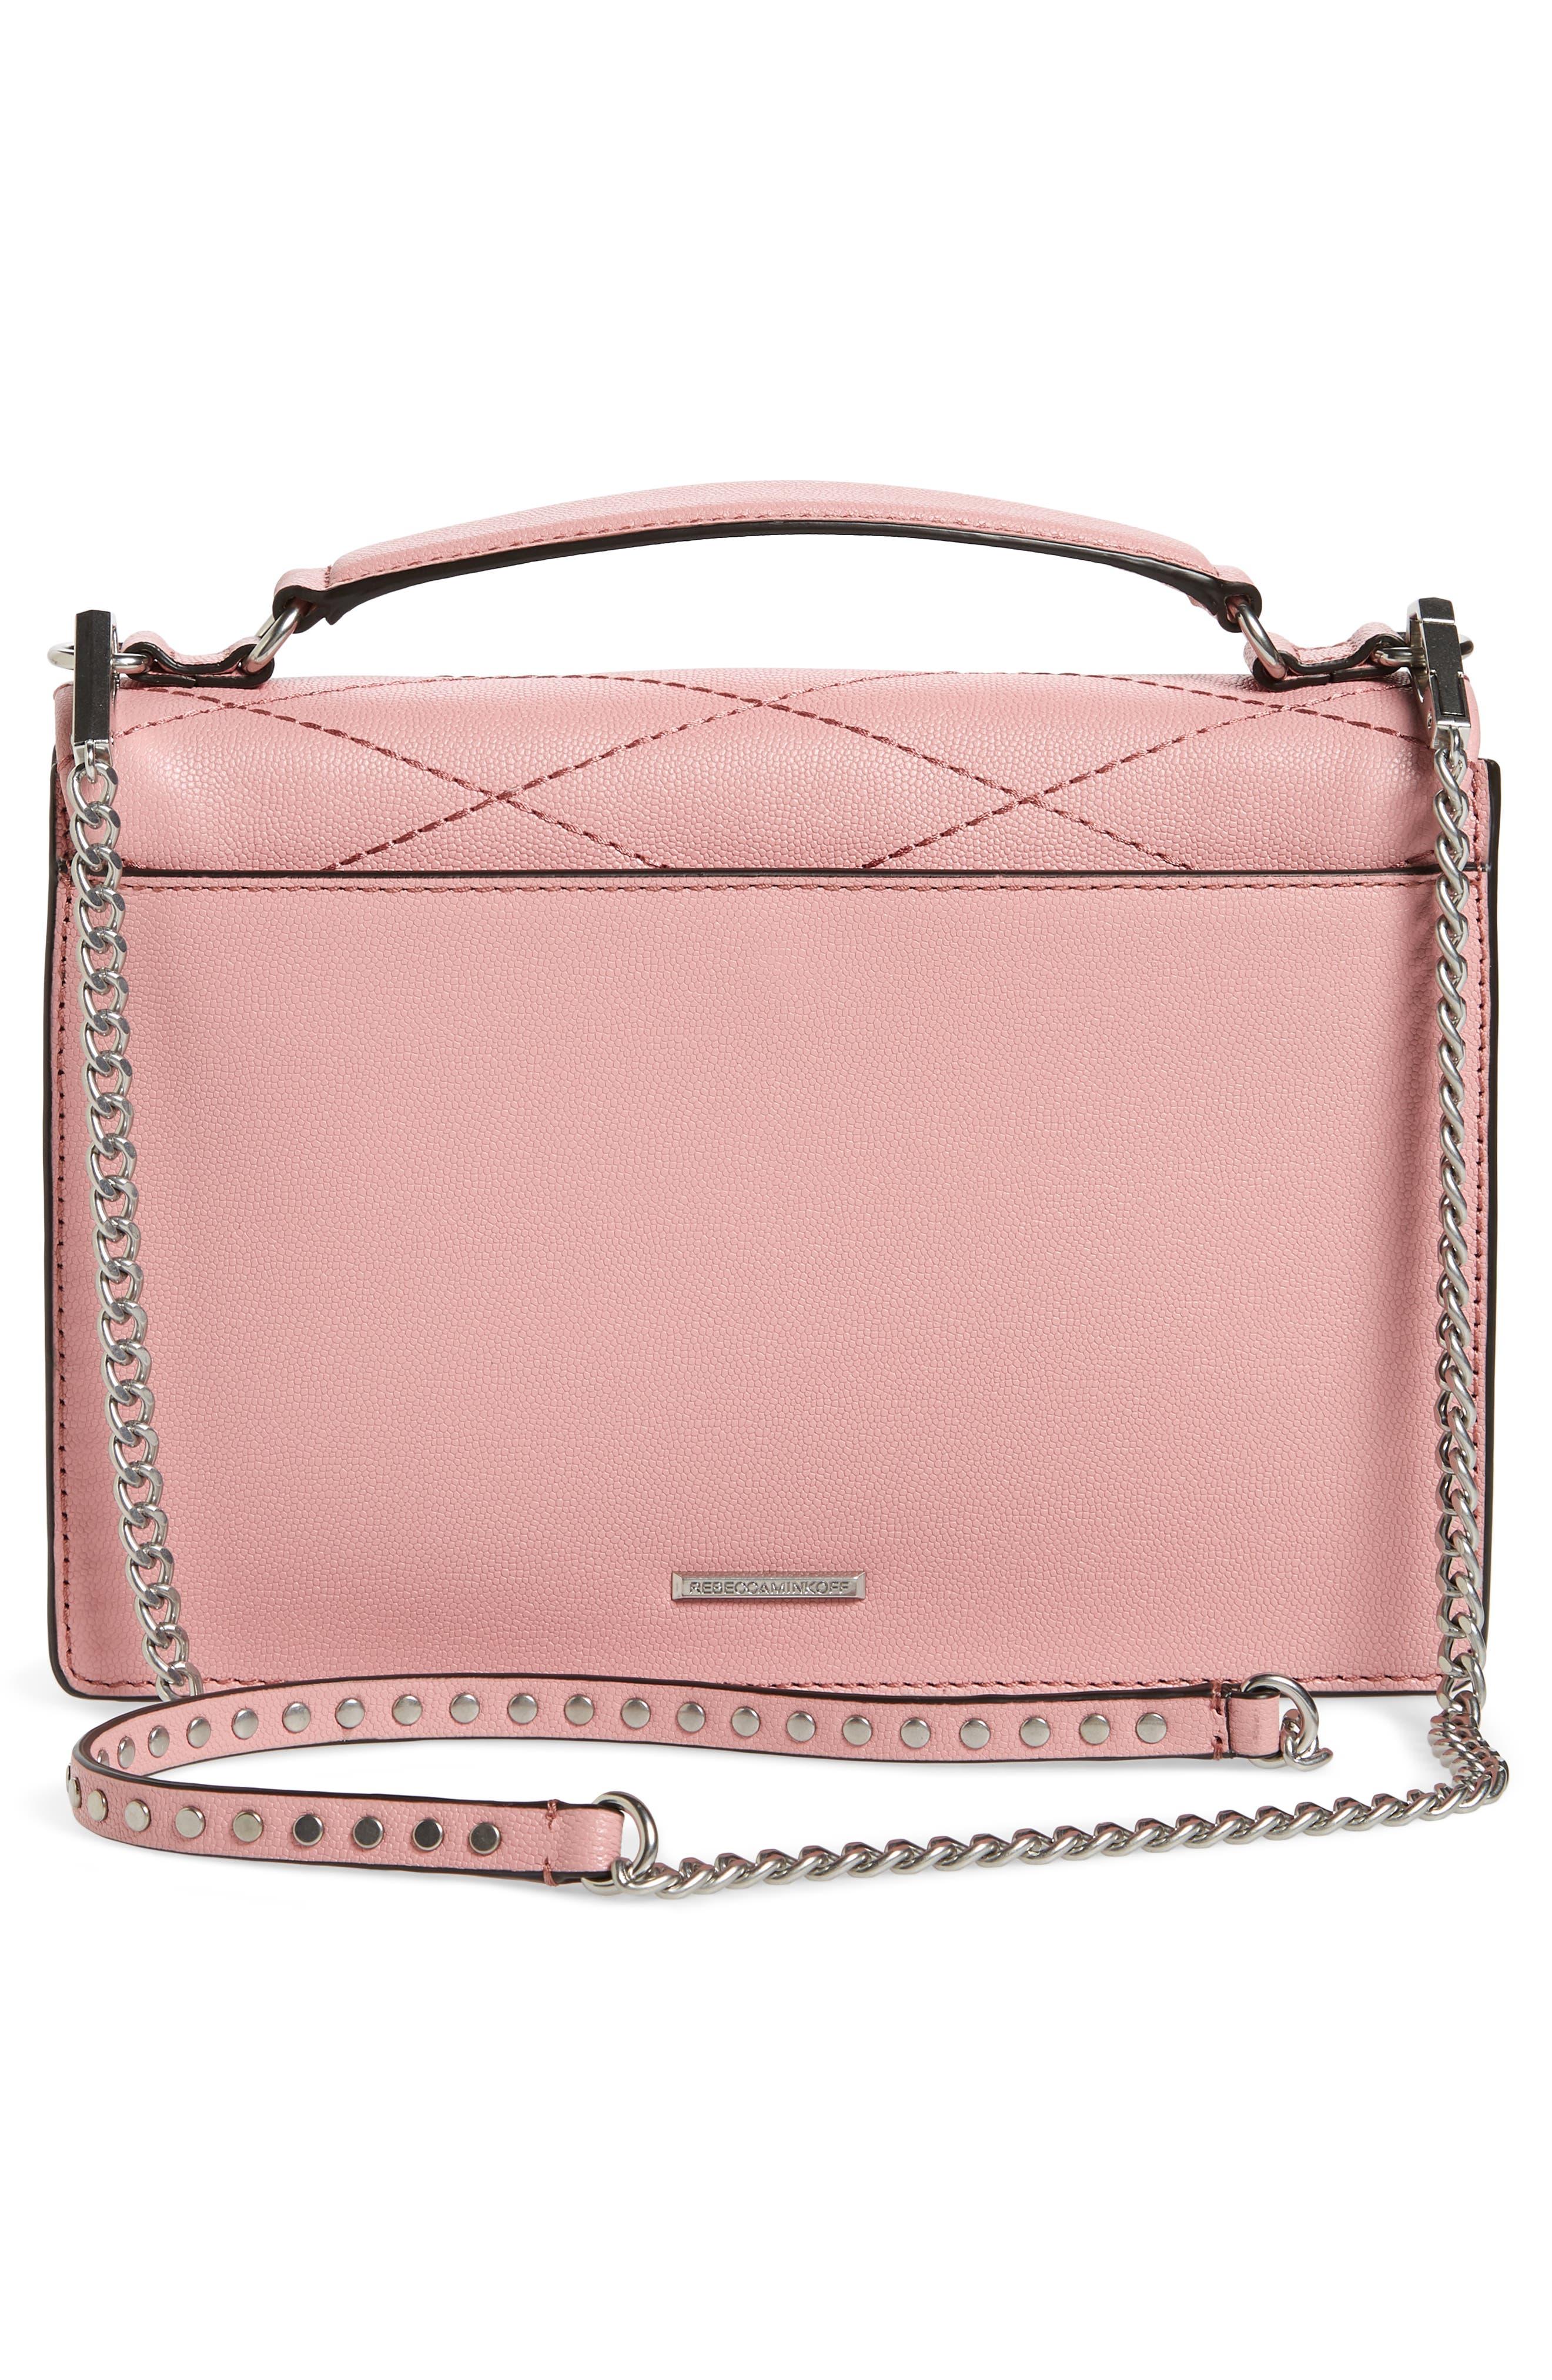 Medium Je T'aime Convertible Leather Crossbody Bag,                             Alternate thumbnail 29, color,